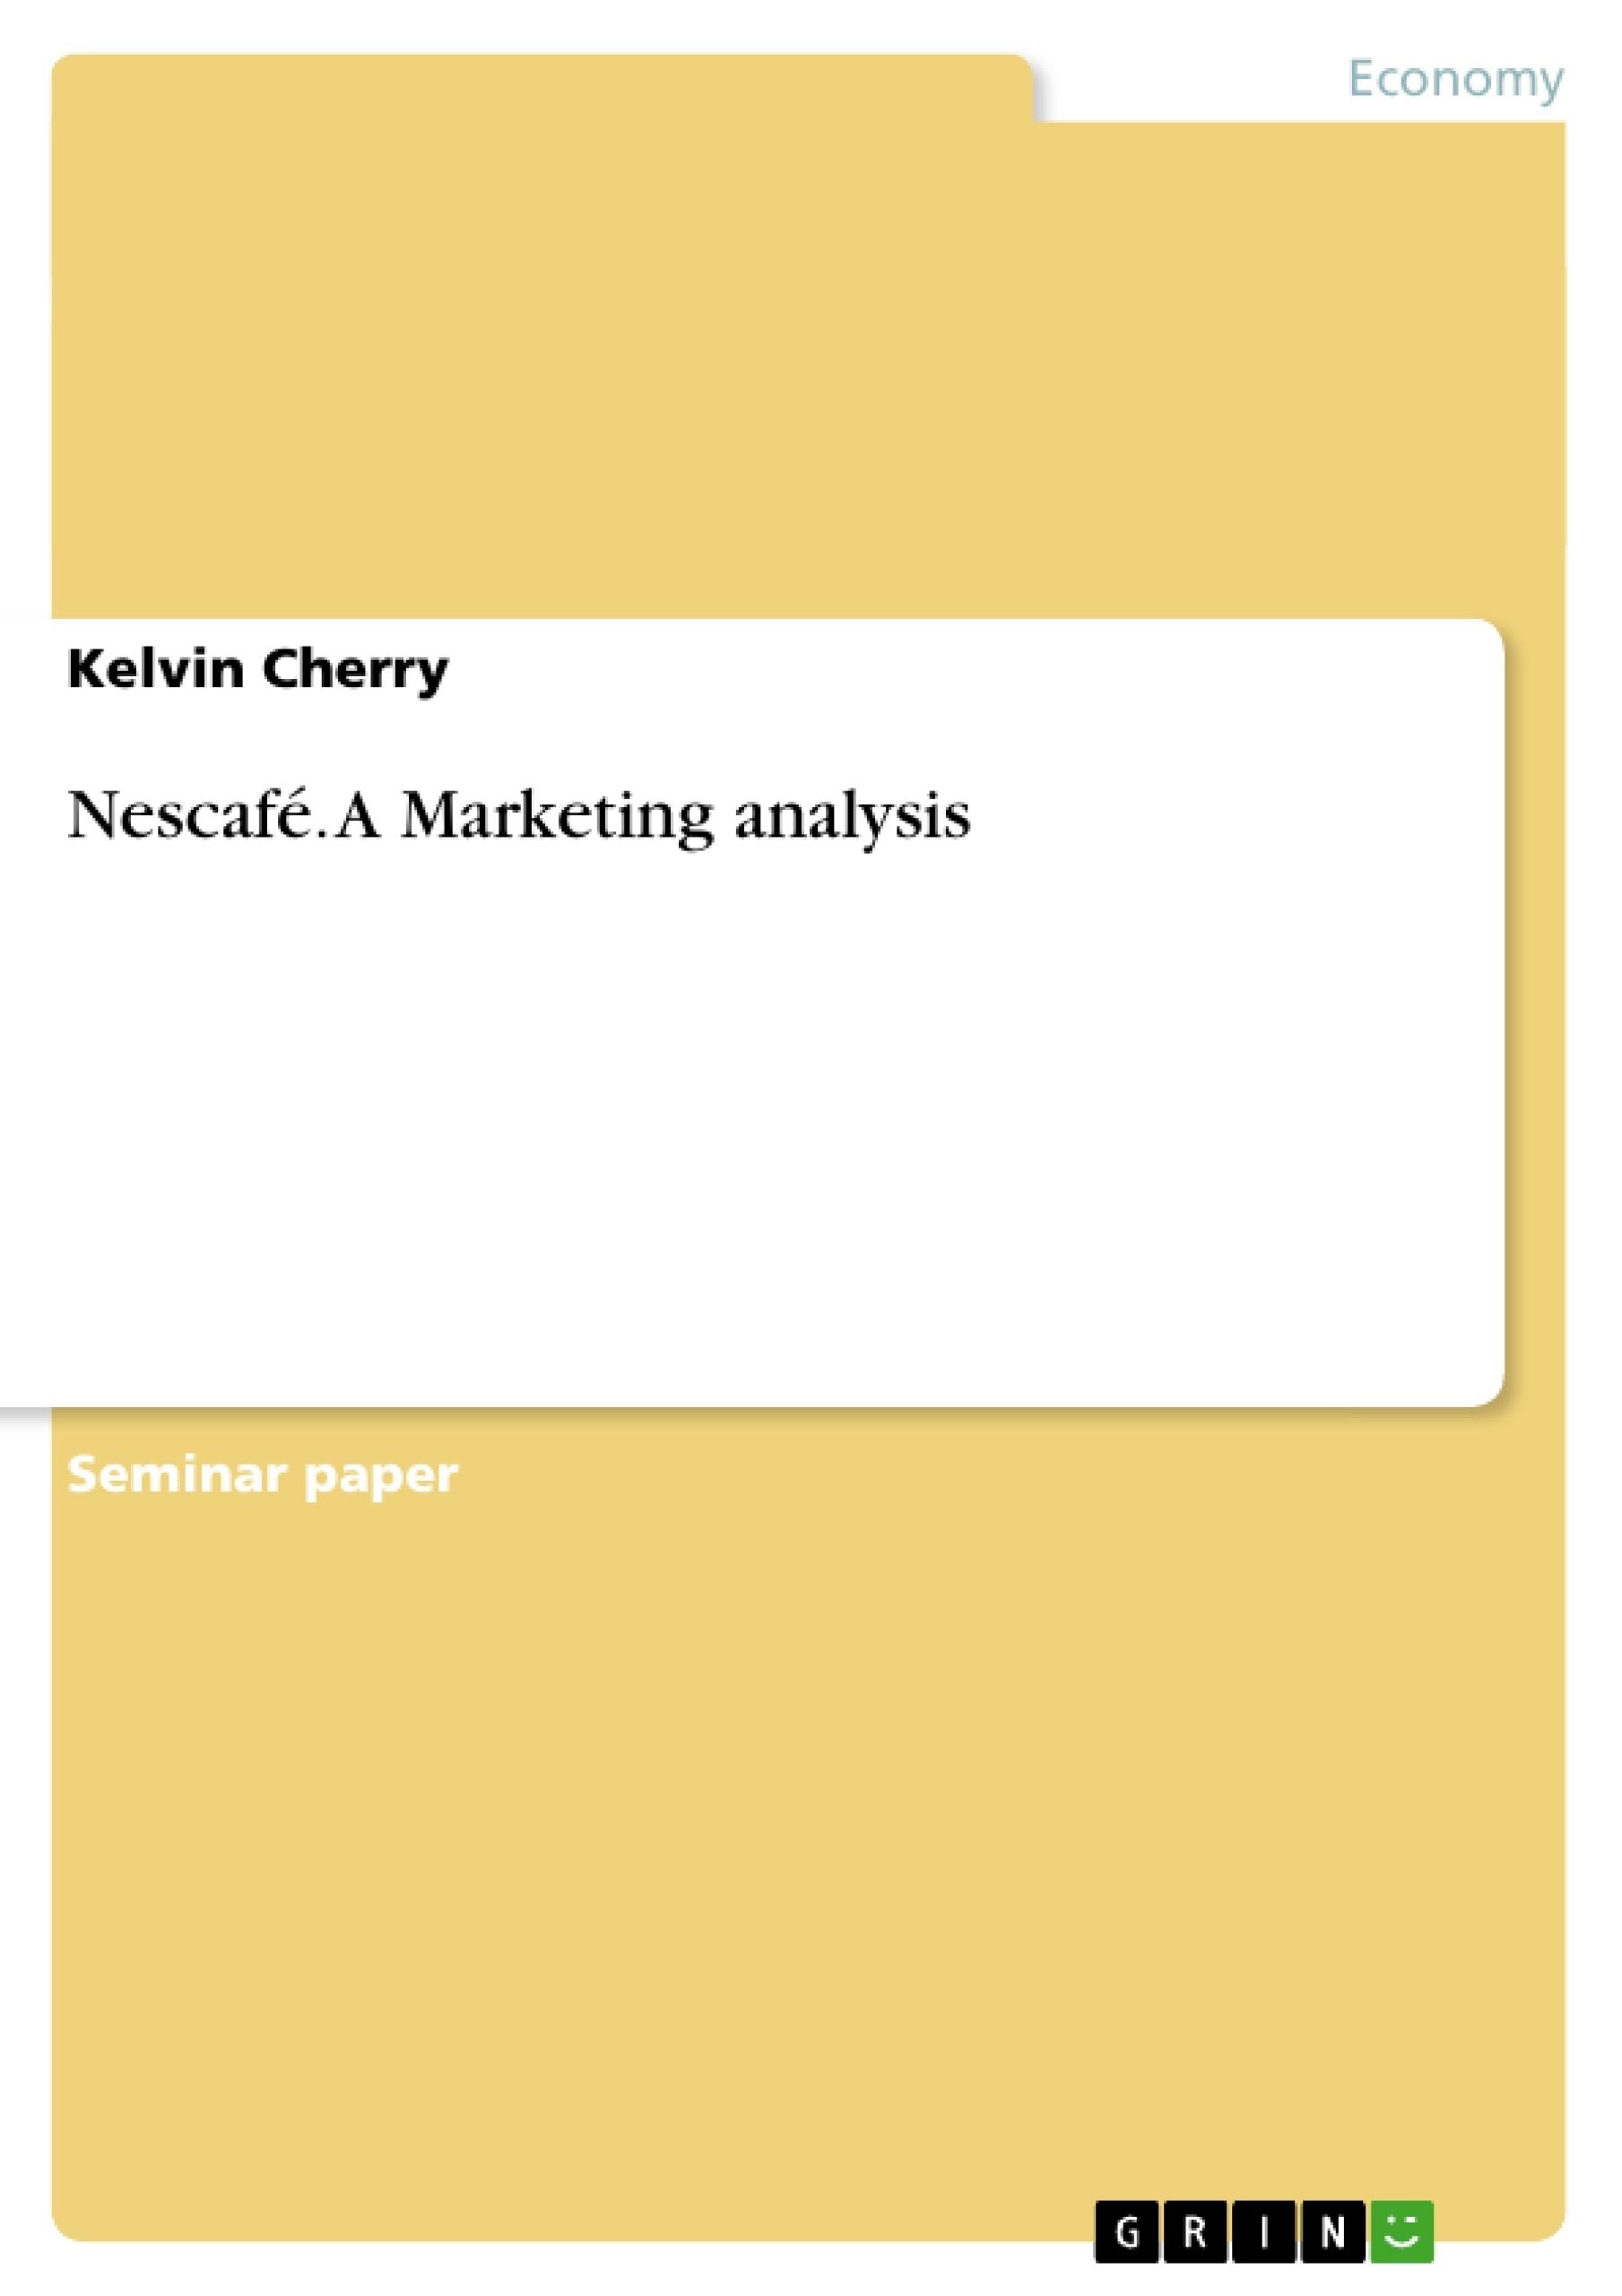 Title: Nescafé. A Marketing analysis